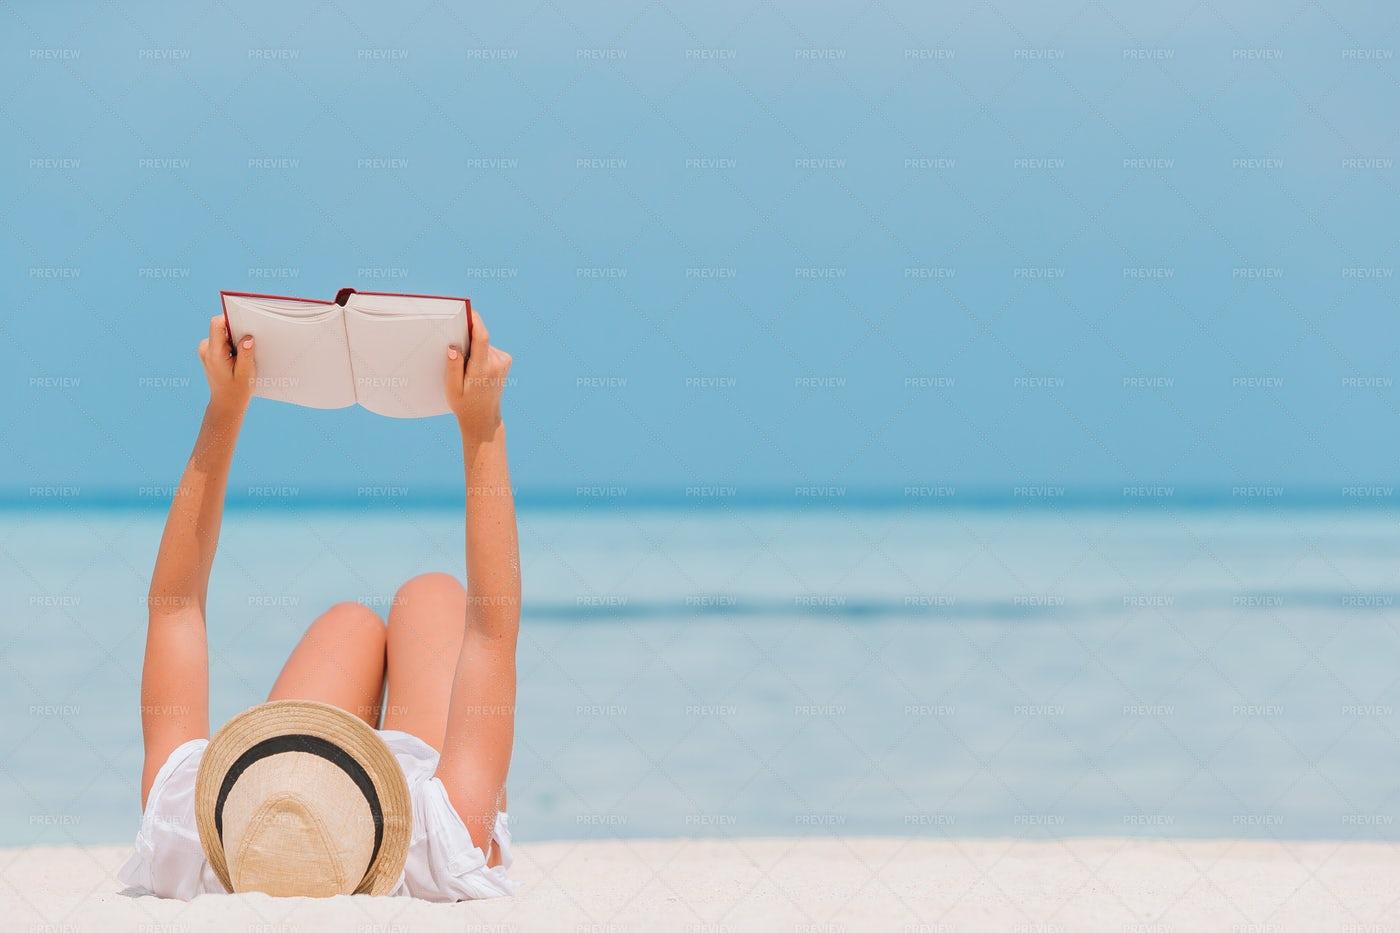 Reading Blank Book On Beach: Stock Photos